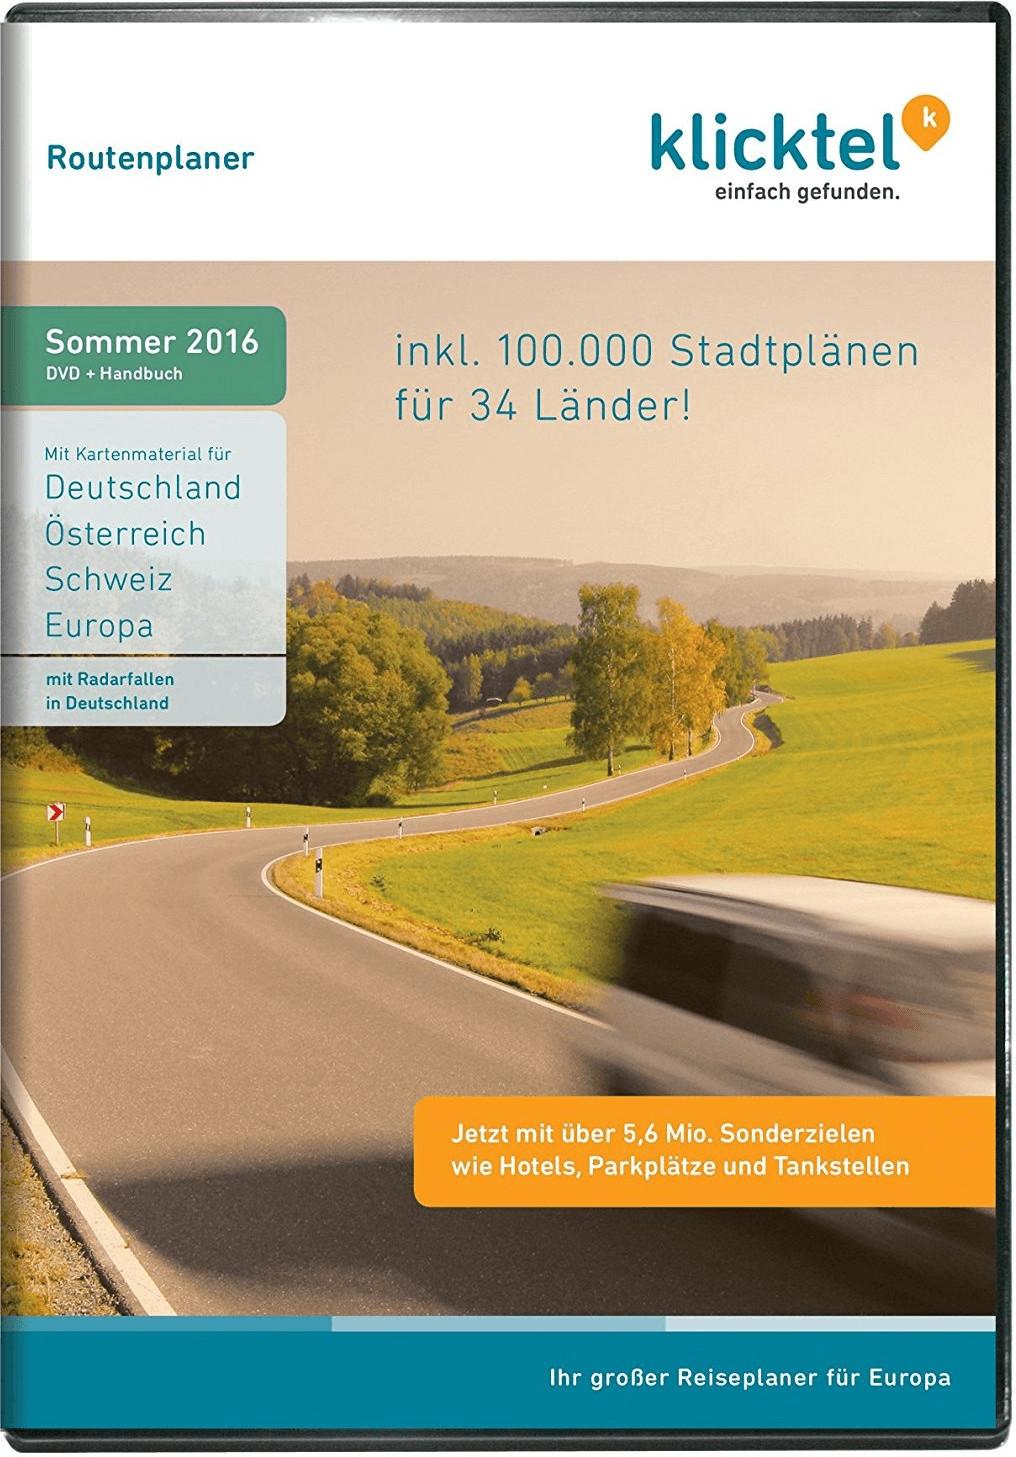 KlickTel Routenplaner Sommer 2016